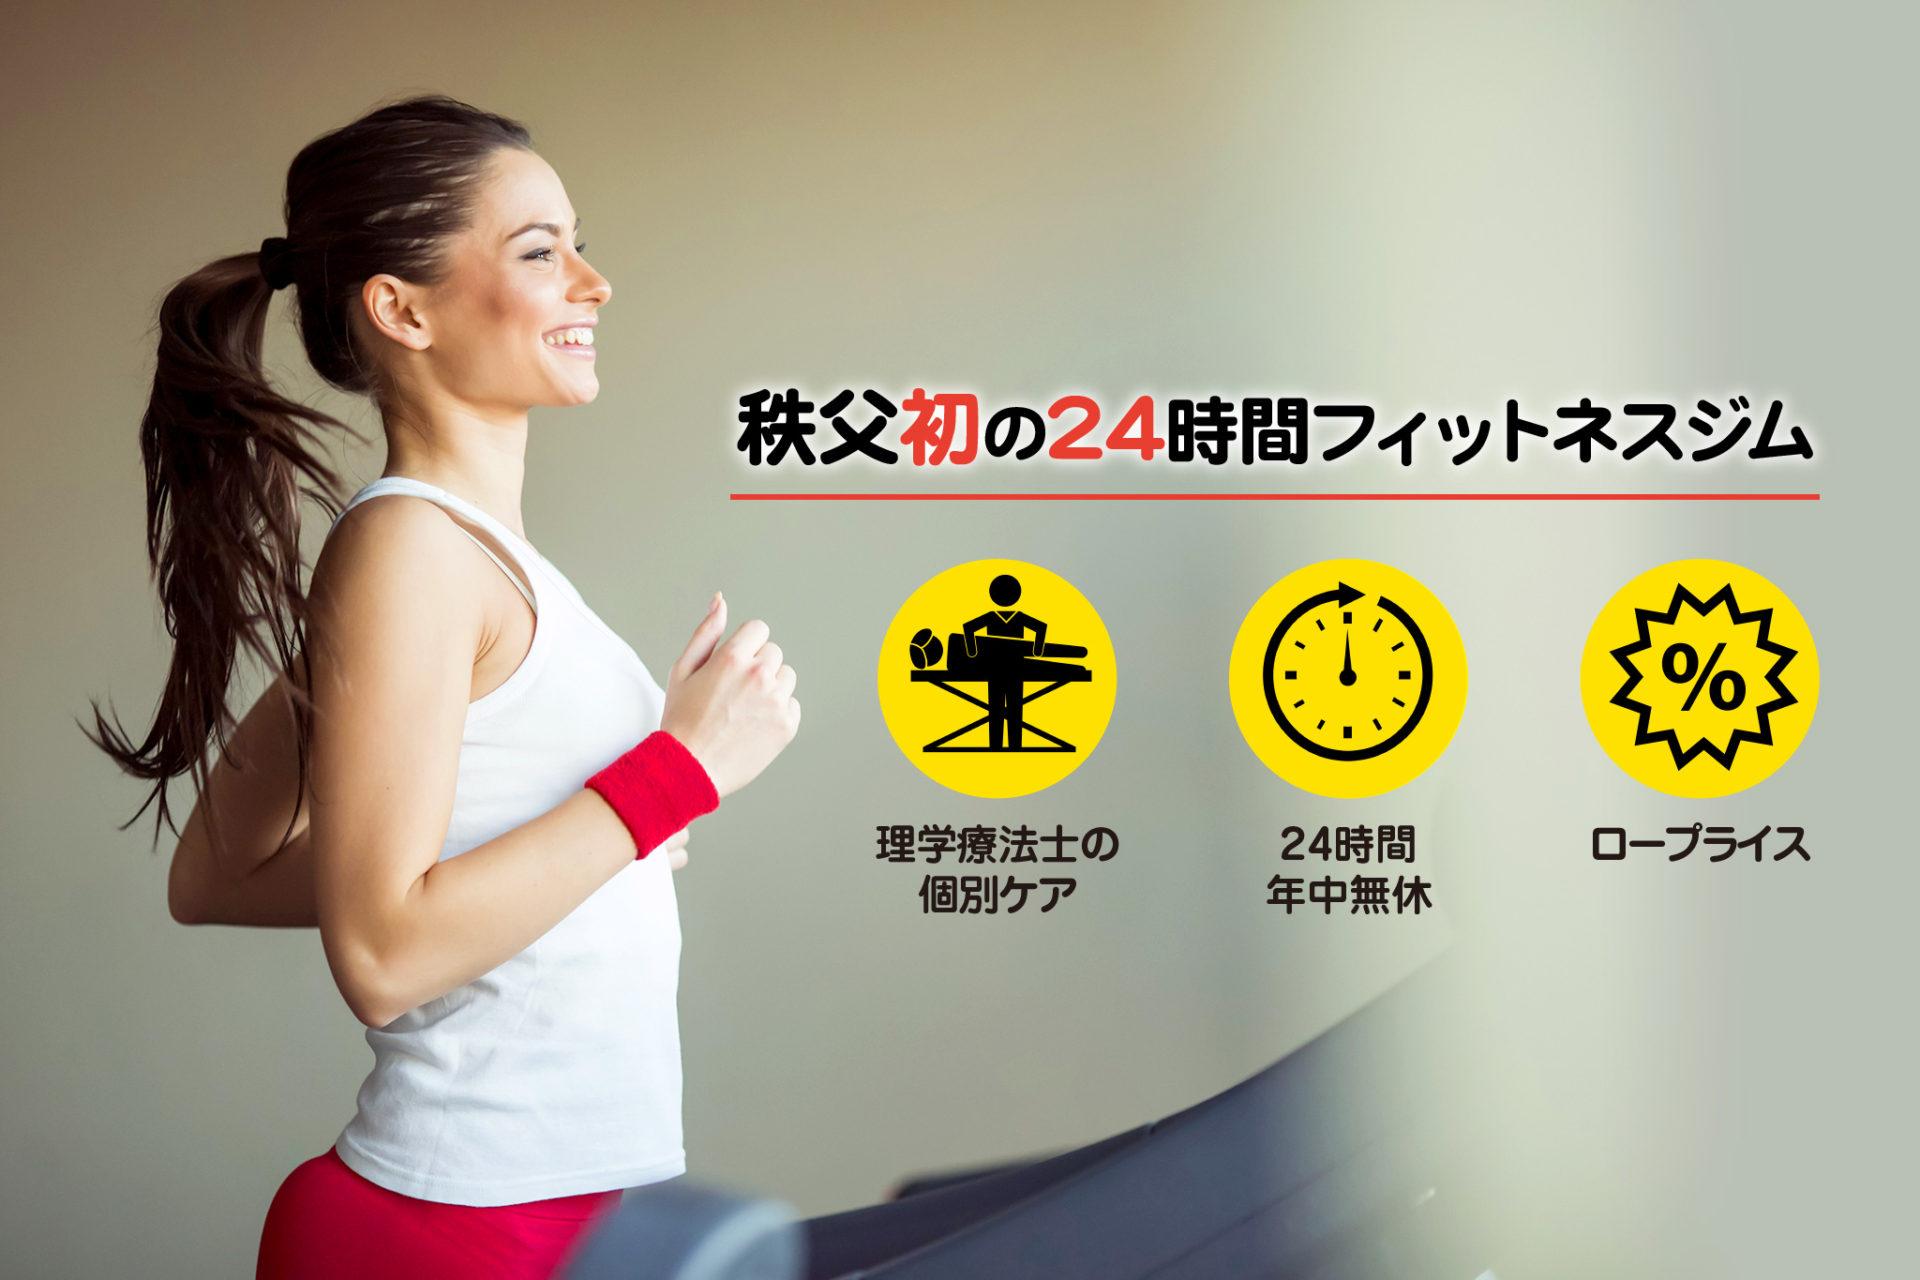 24h Fitness Gym/理学療法士のリハビリ整体 ビーナイス